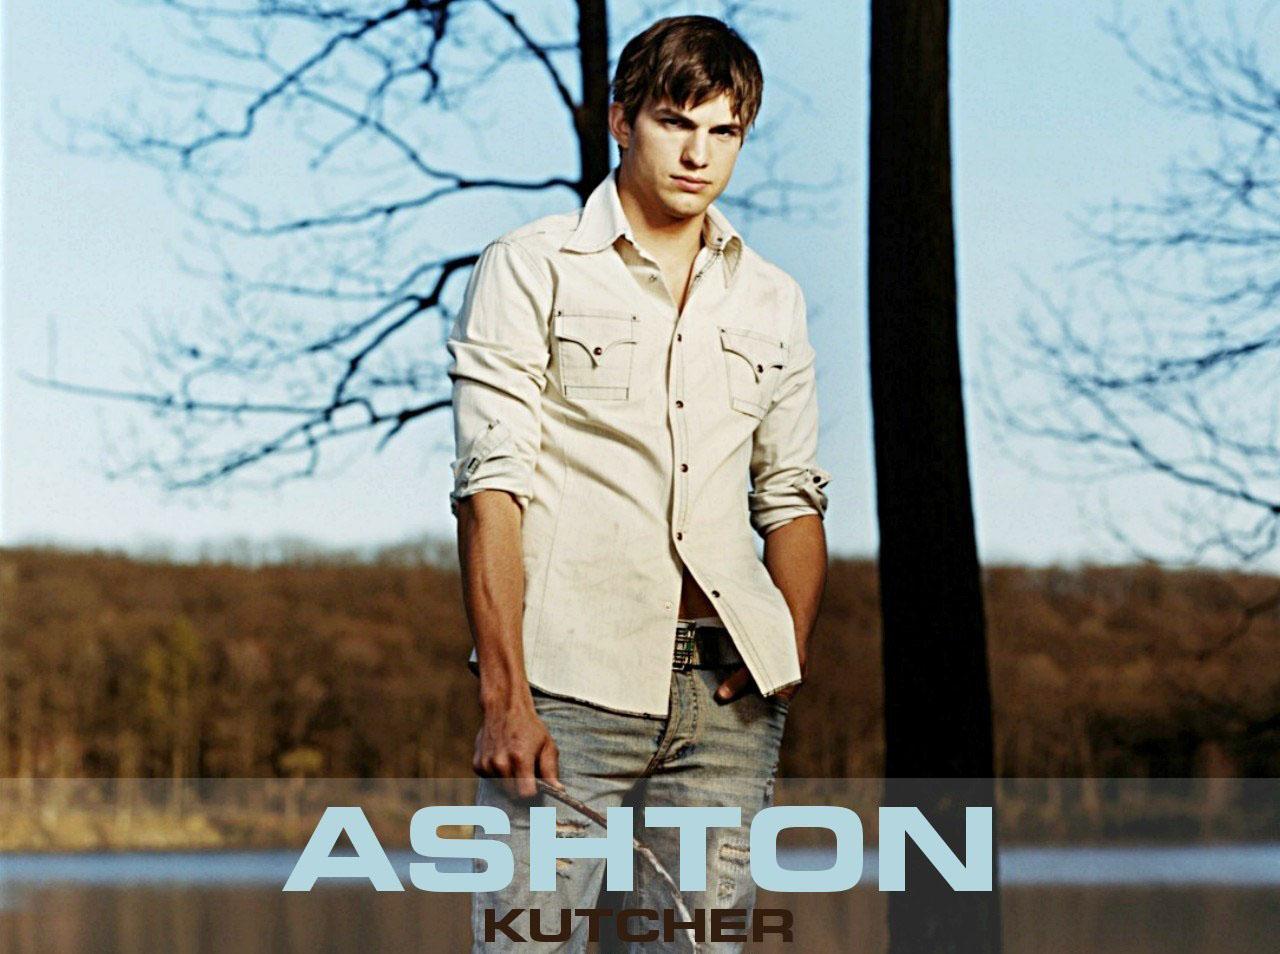 http://3.bp.blogspot.com/-4D1gGIQPhEM/UGMFYNmOyQI/AAAAAAAACls/K5AtYvxaqak/s1600/Ashton-ashton-kutcher-3325018-1280-1024.jpg